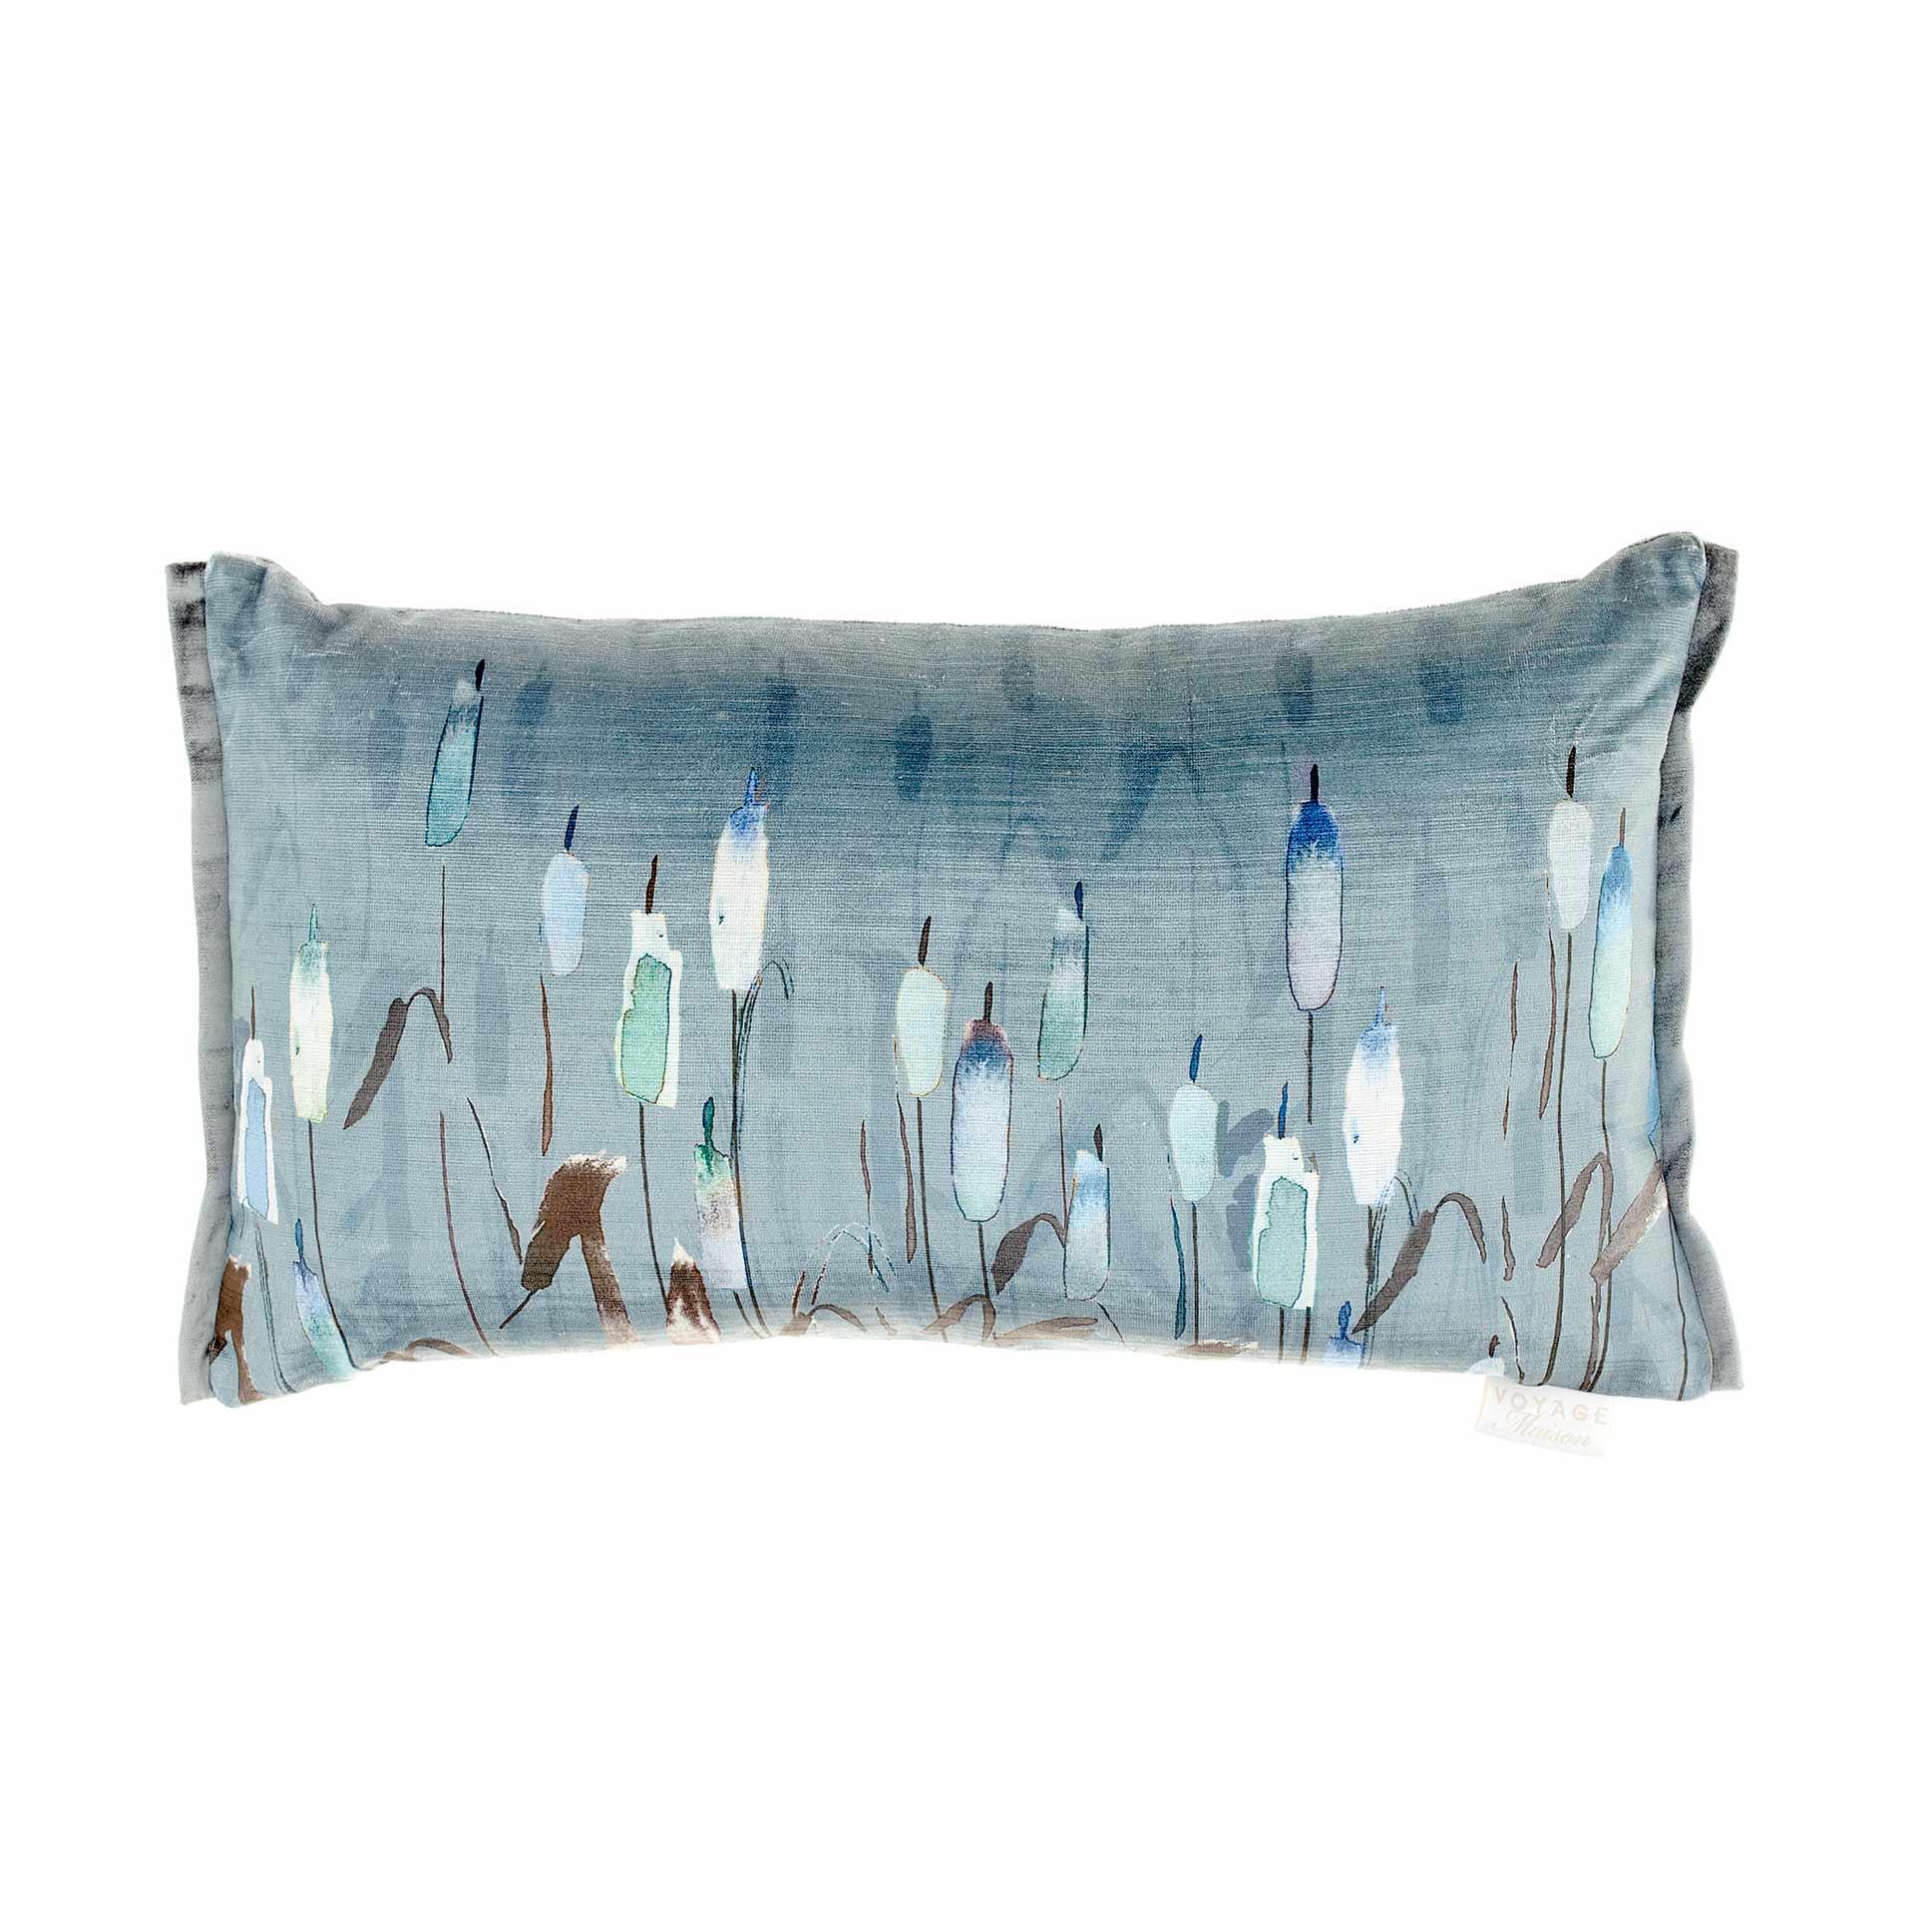 Orientalis Cobalt Velvet Cushion 35x60cm